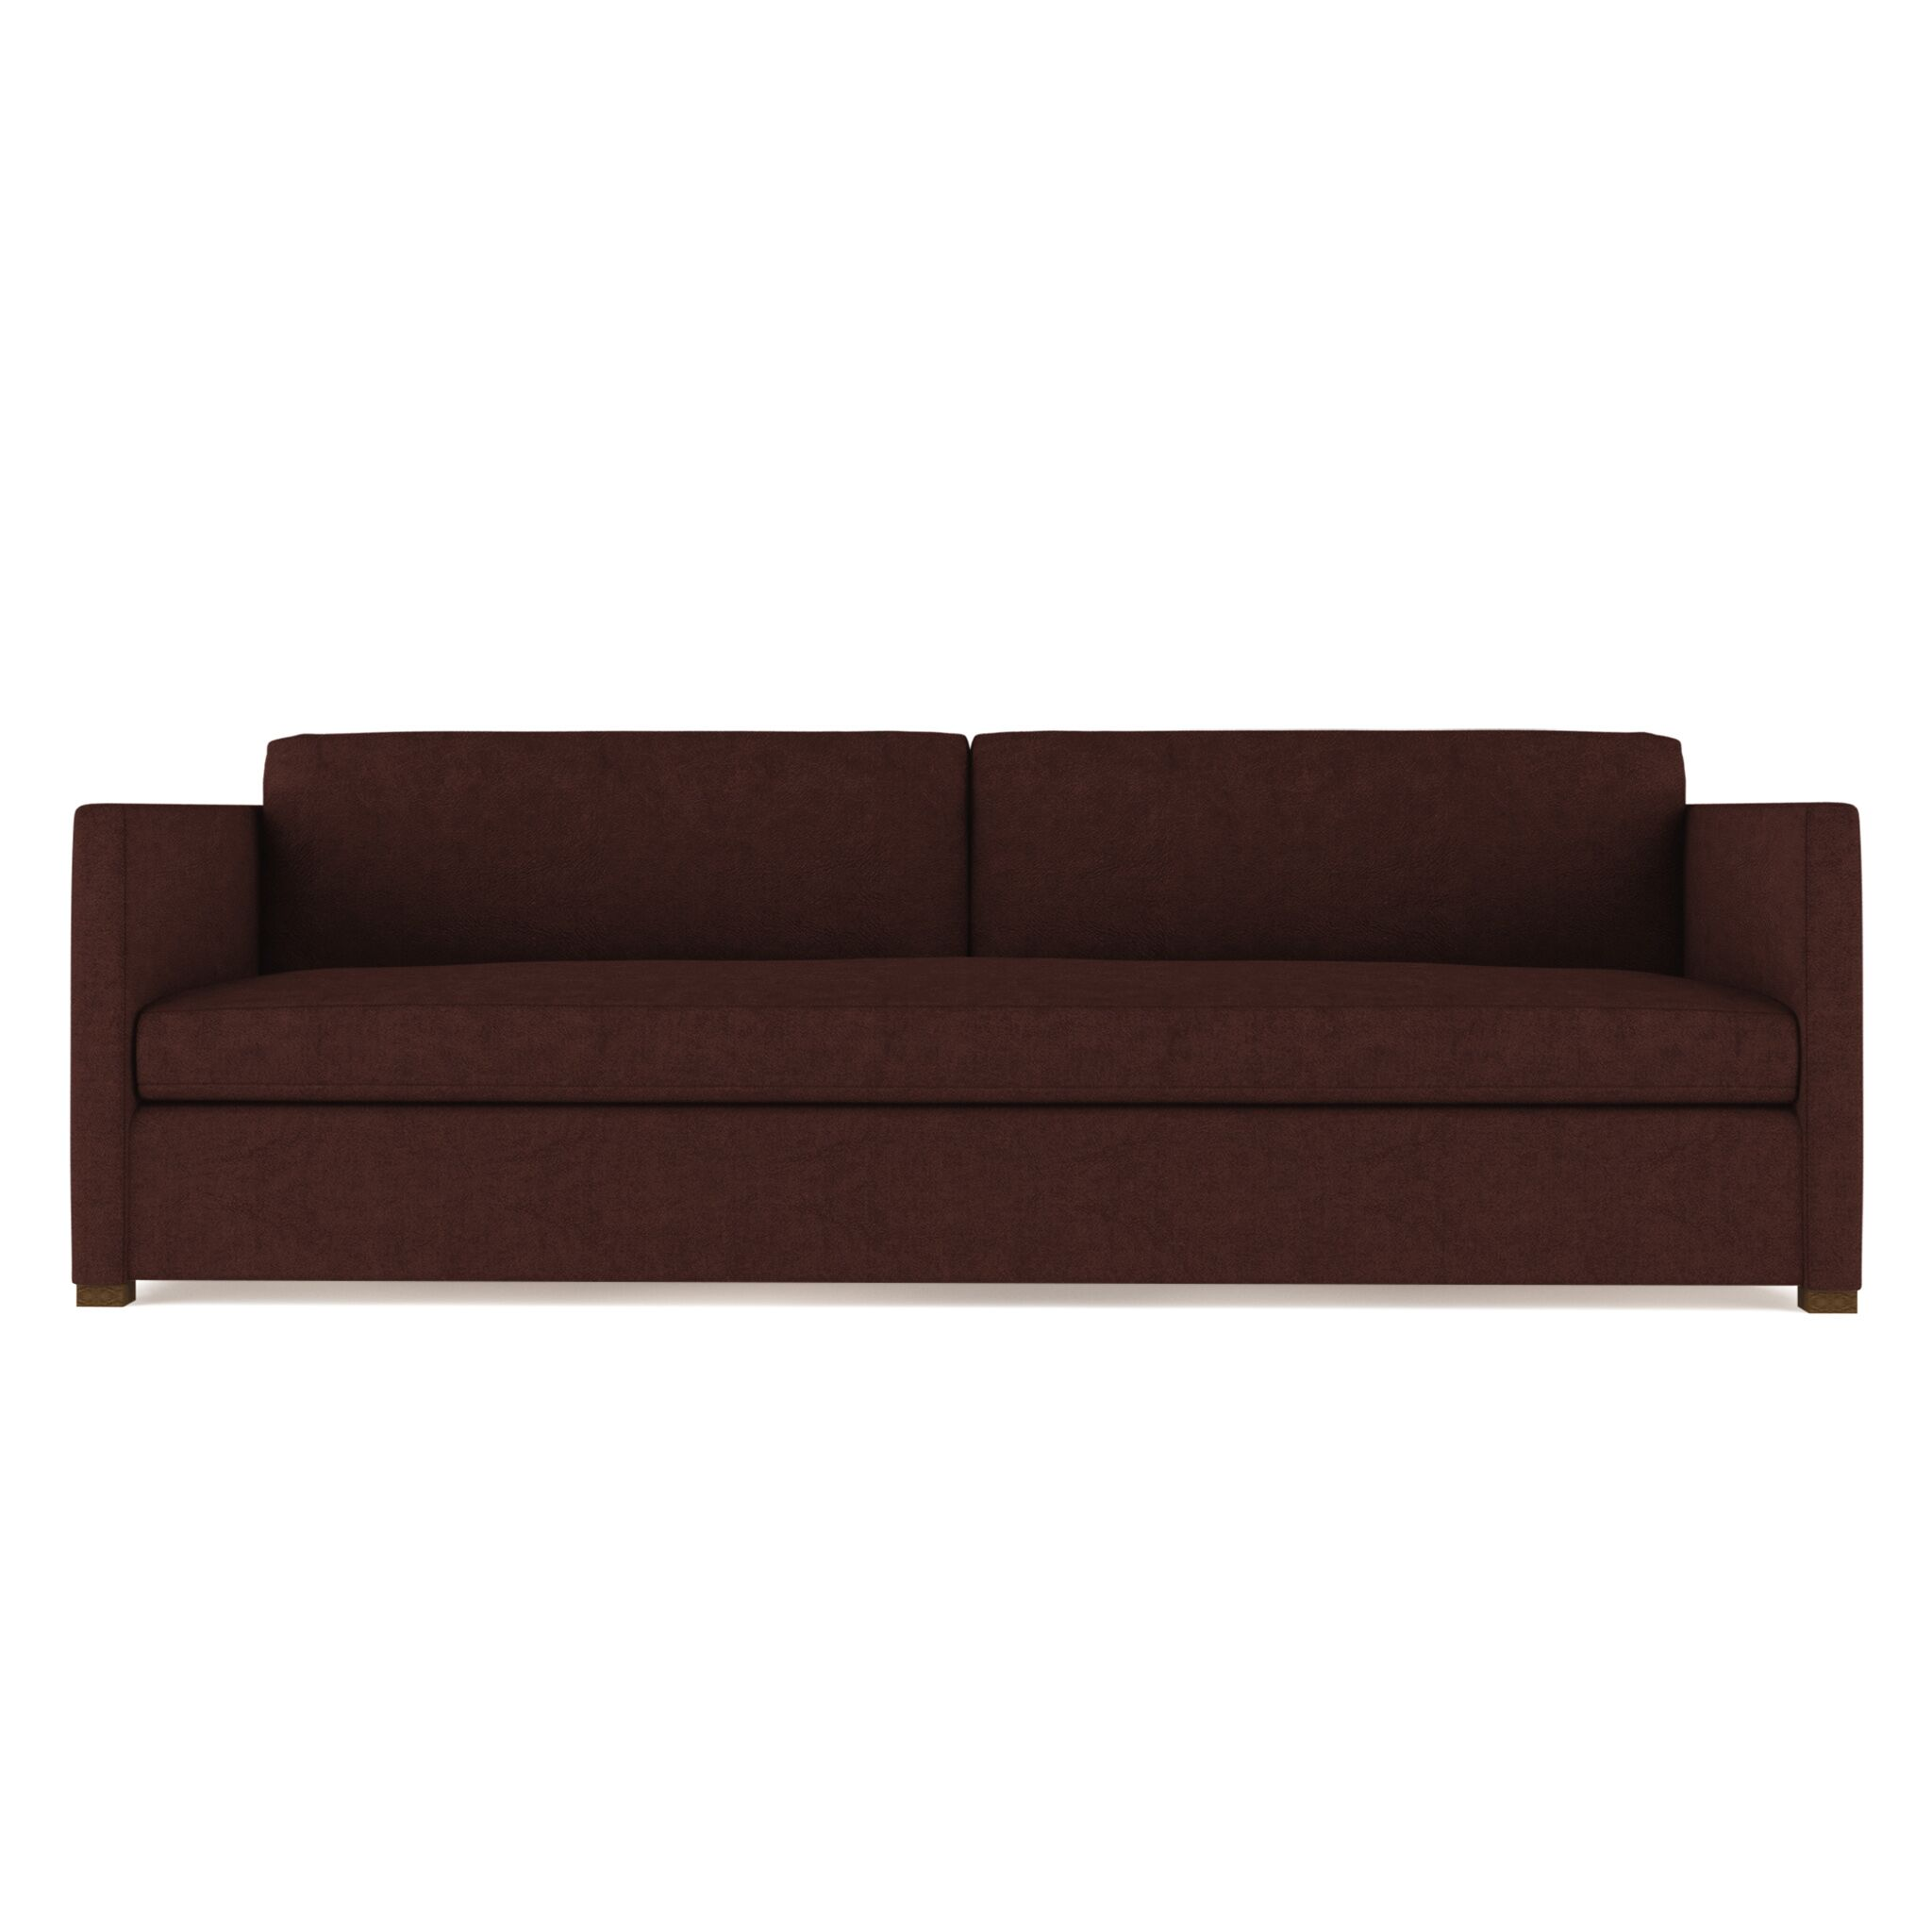 Leedom Leather Sofa Upholstery: Bear Creek, Size: 33